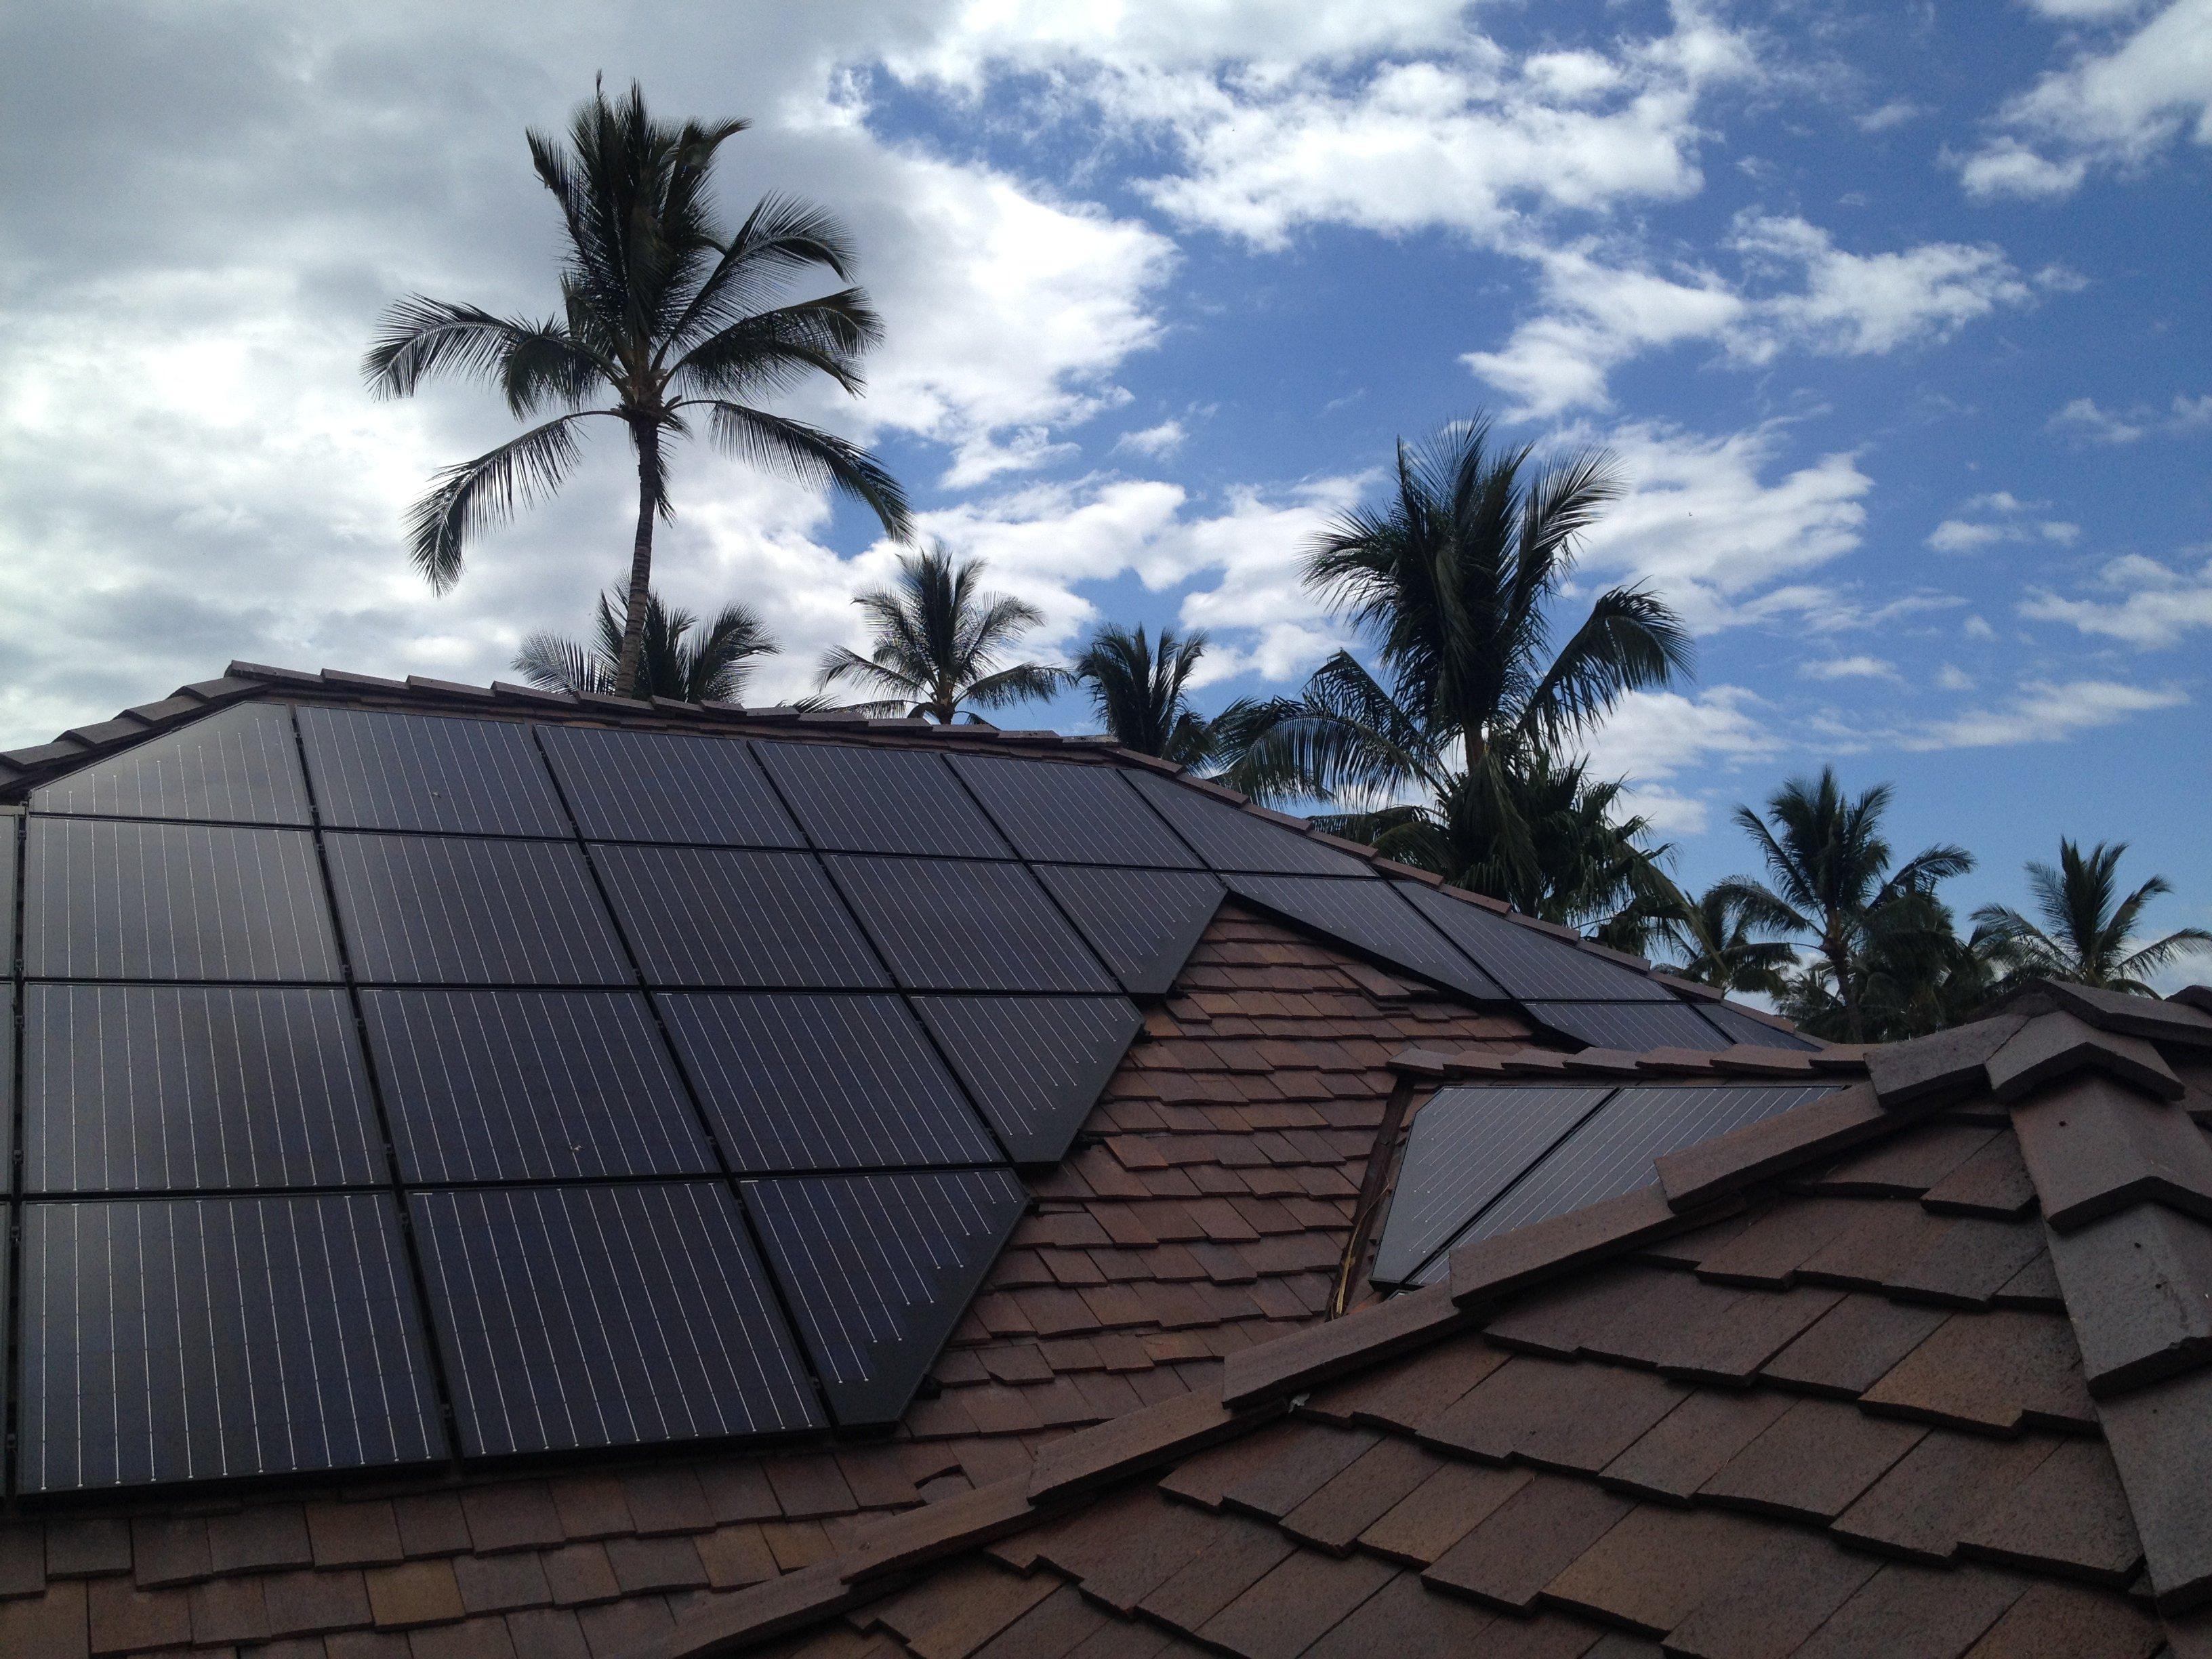 22.67 KW Solar PV system installed on rooftop in Honokaa, HI